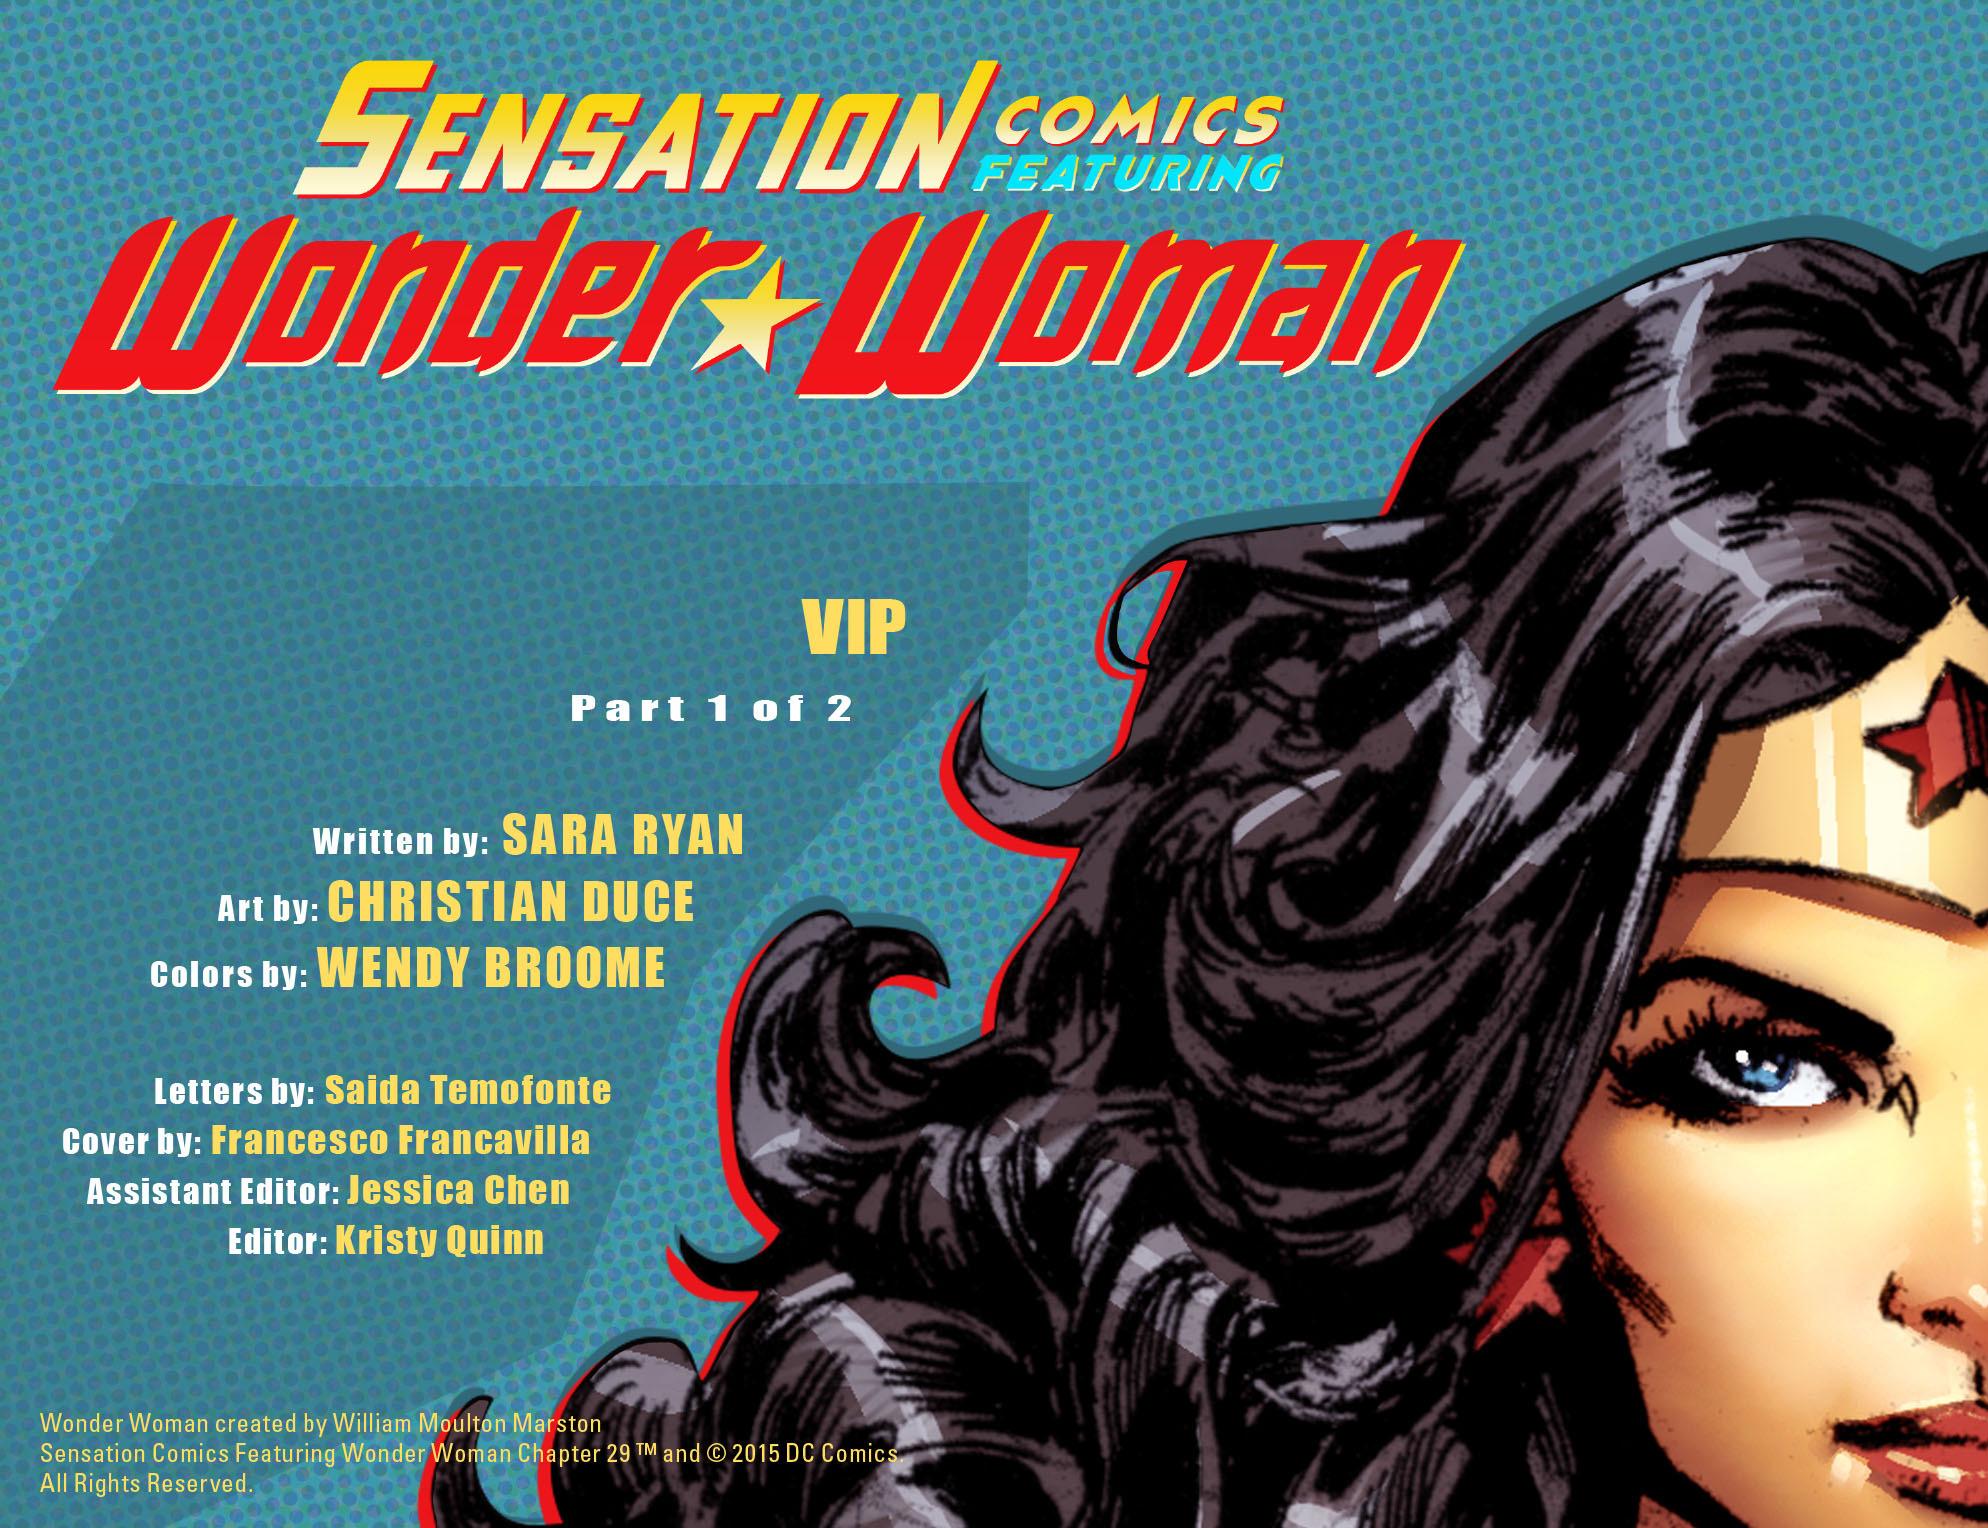 Read online Sensation Comics Featuring Wonder Woman comic -  Issue #29 - 2